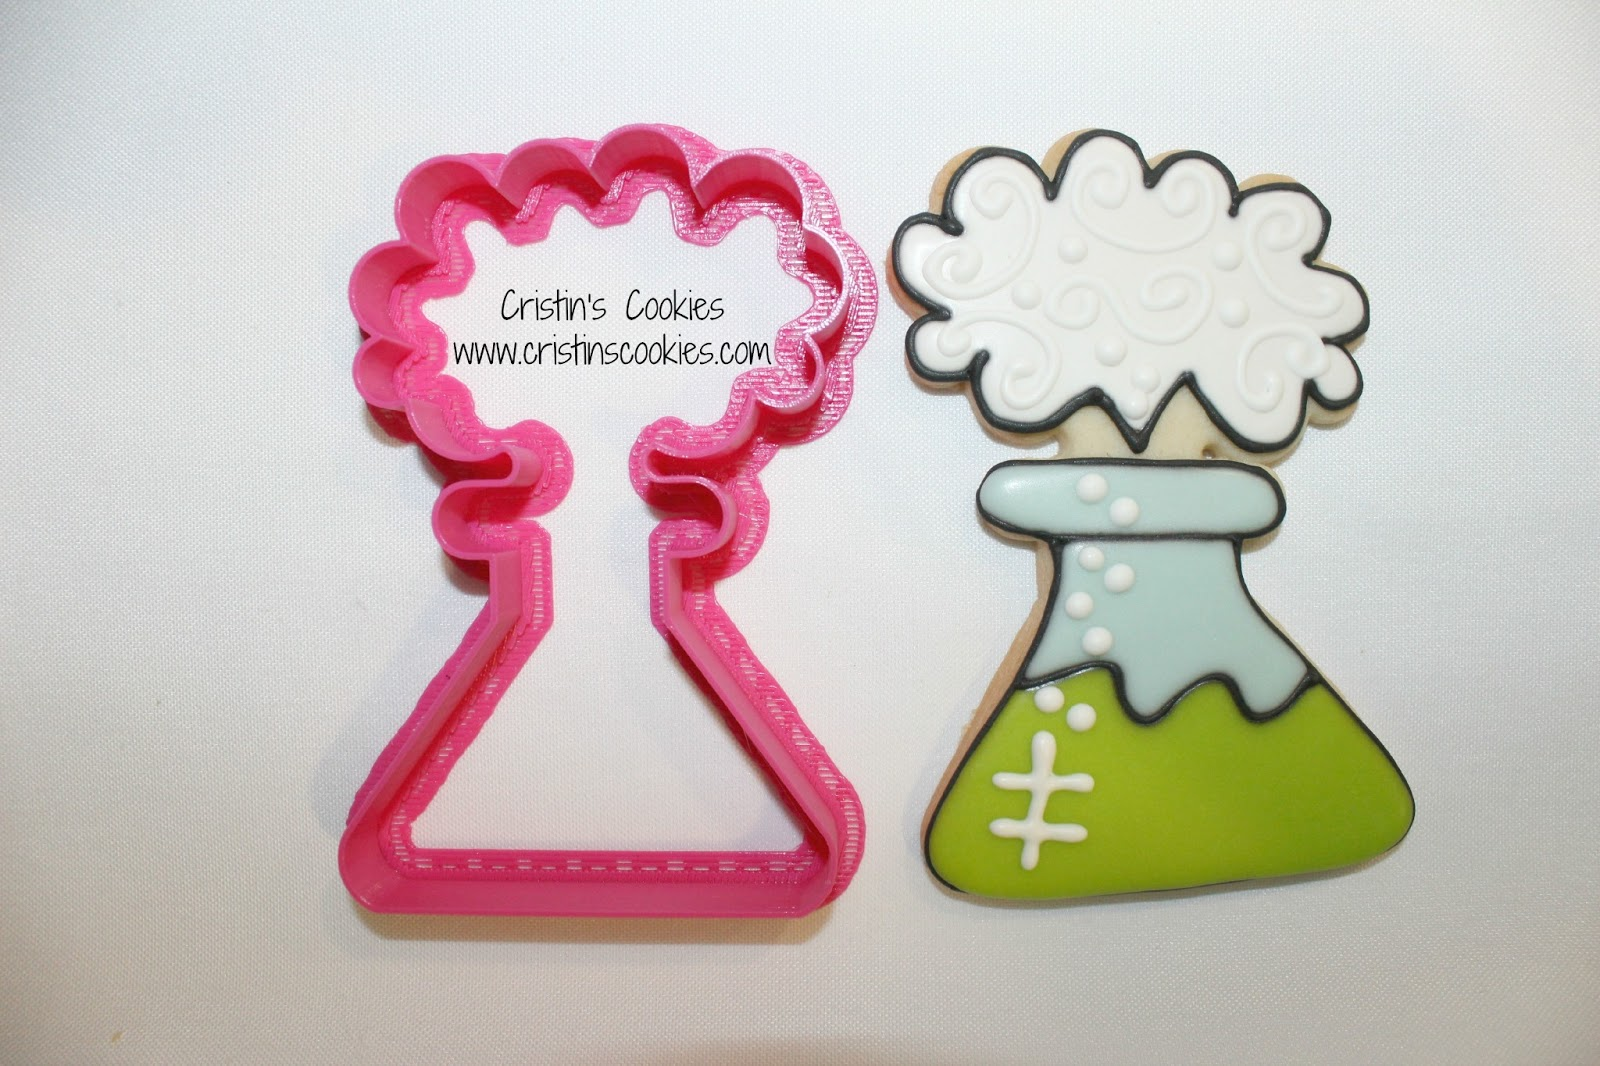 Cristin\'s Cookies: May 2013